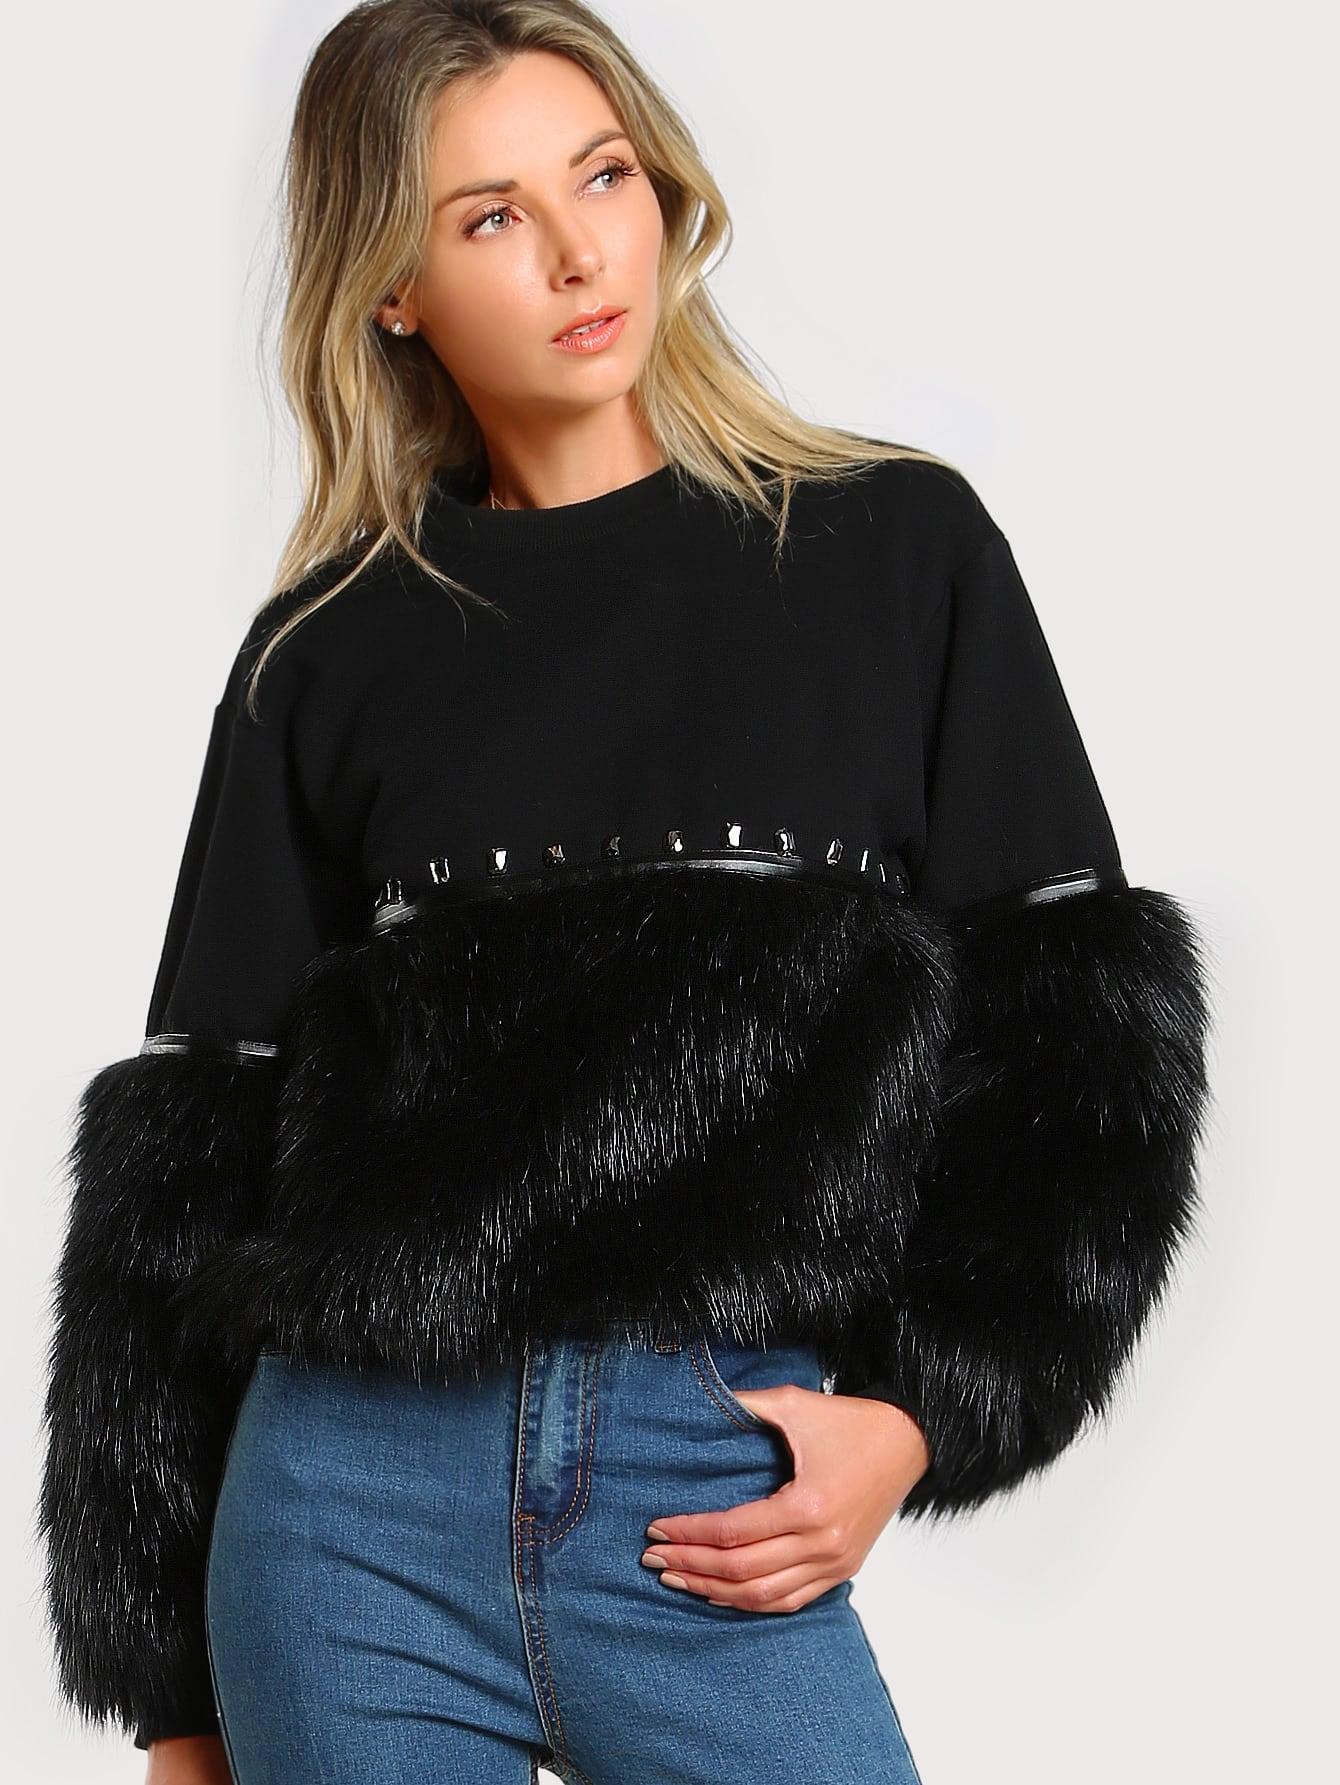 Gem Beading Faux Fur Panel Sweatshirt drop shoulder contrast faux fur sleeve sweatshirt